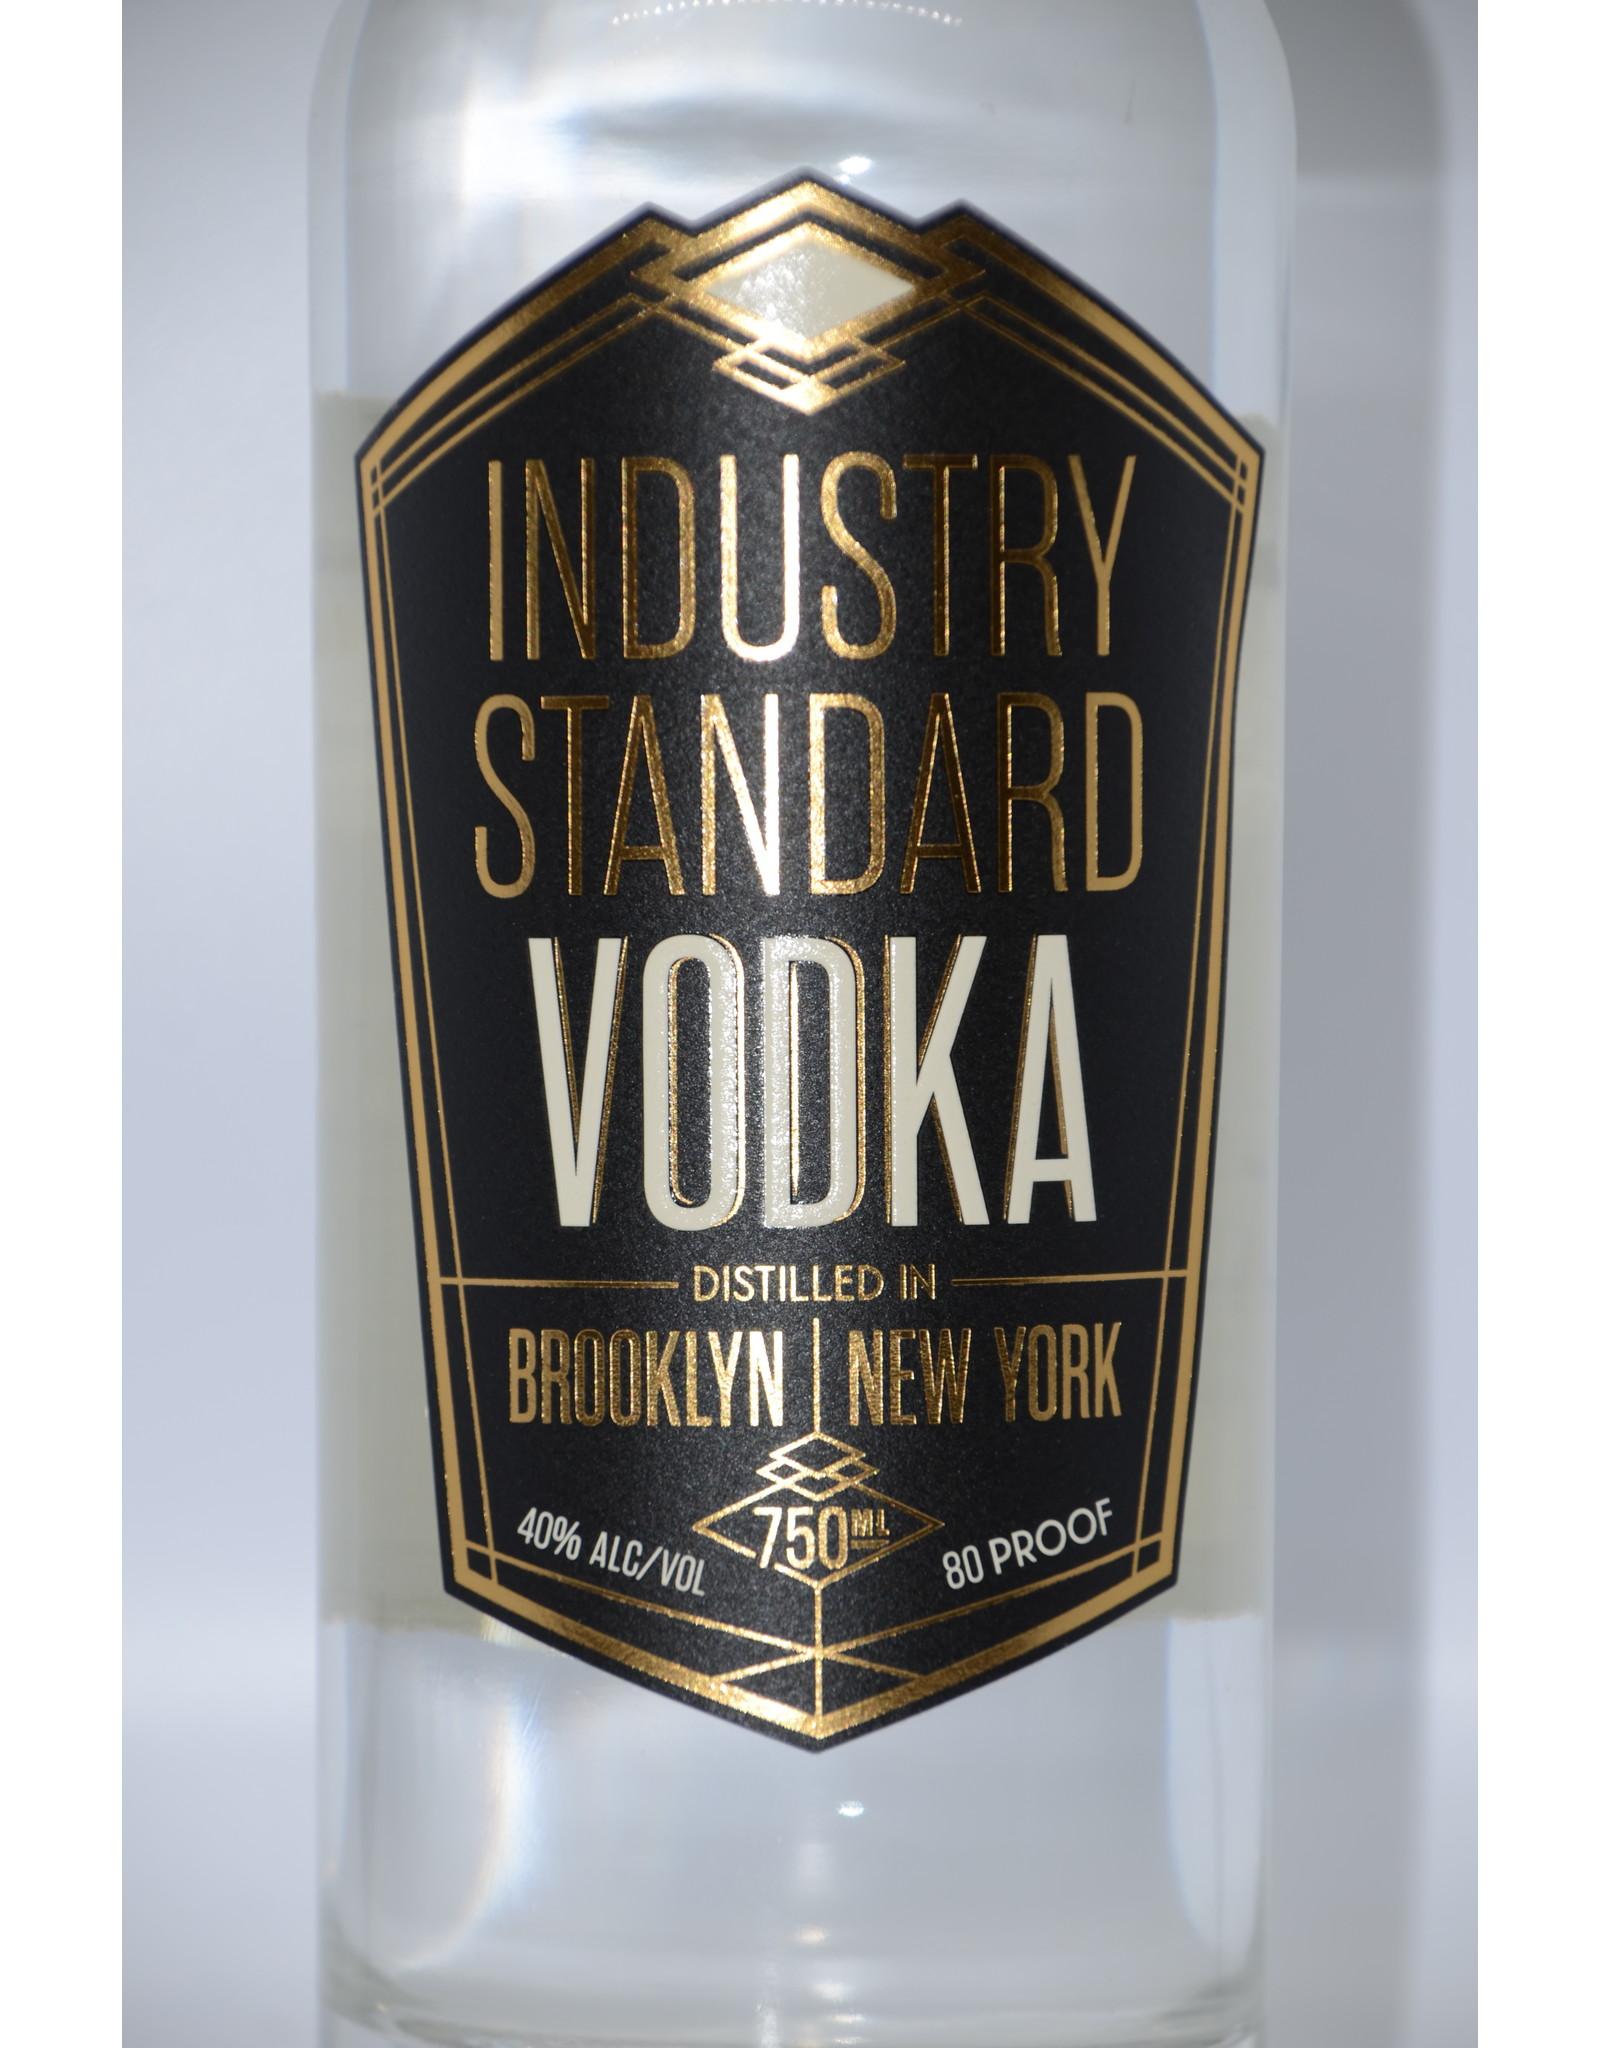 USA Industry Standard Vodka